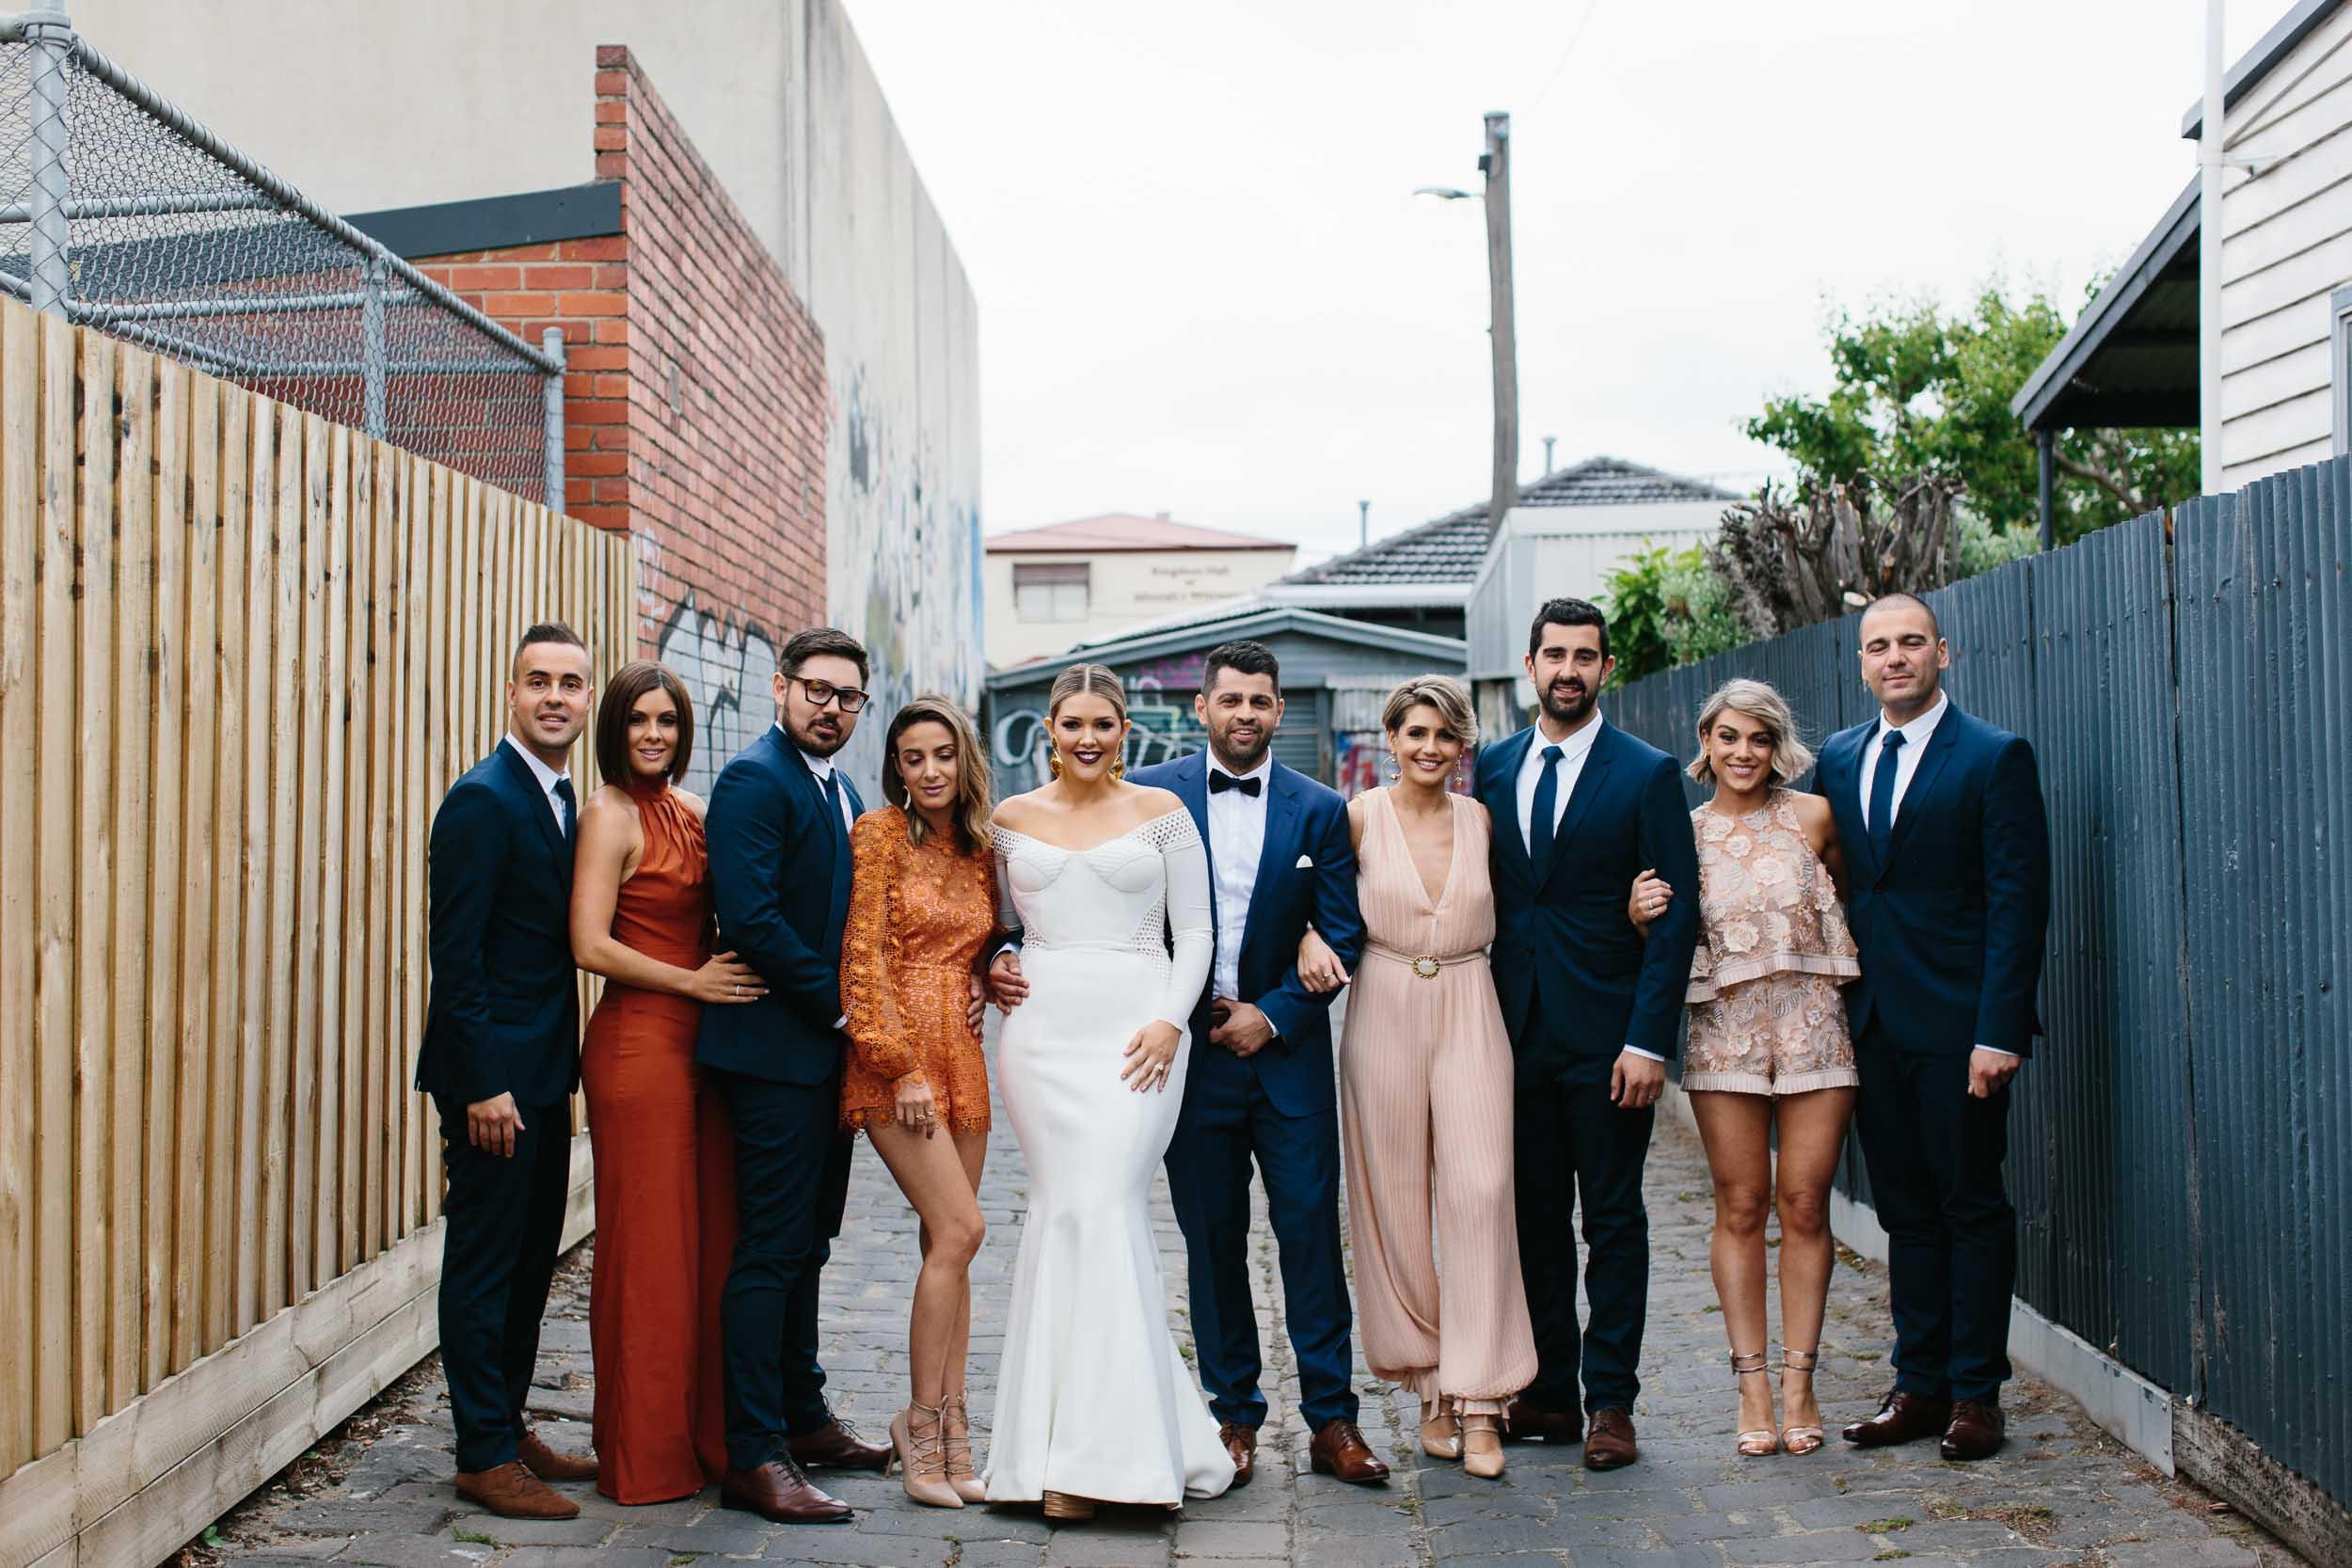 Kas-Richards-Urban-Melbourne-Wedding-Jason-Grech-625.jpg